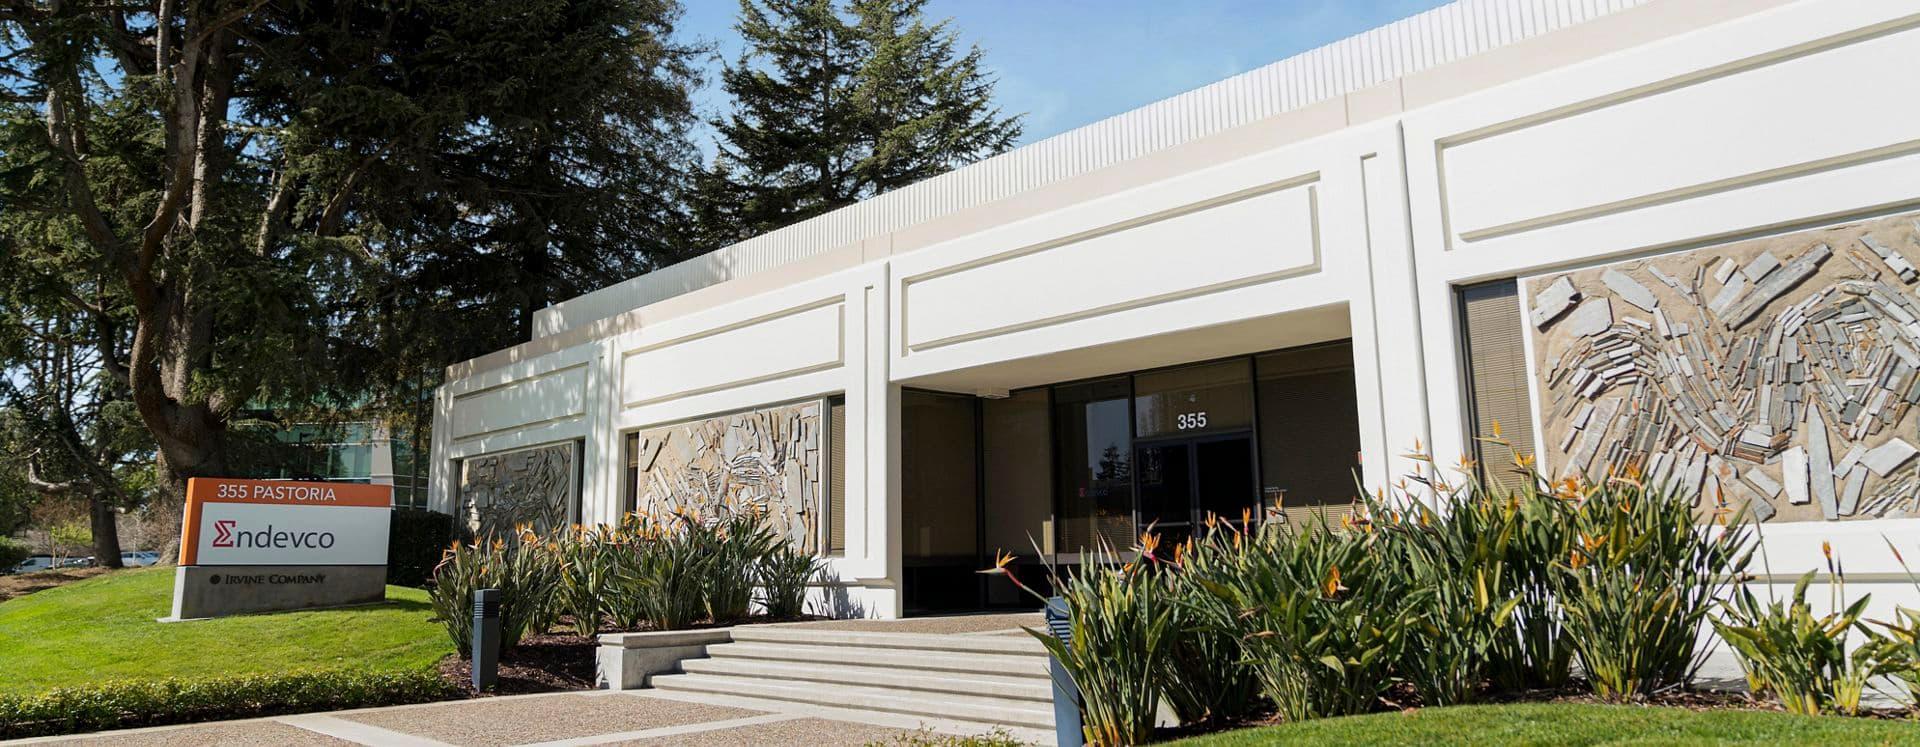 Exterior building photography of 320 Soquel Way & 430 Indio Way in Soquel Way/Indio, in Sunnyvale, California.